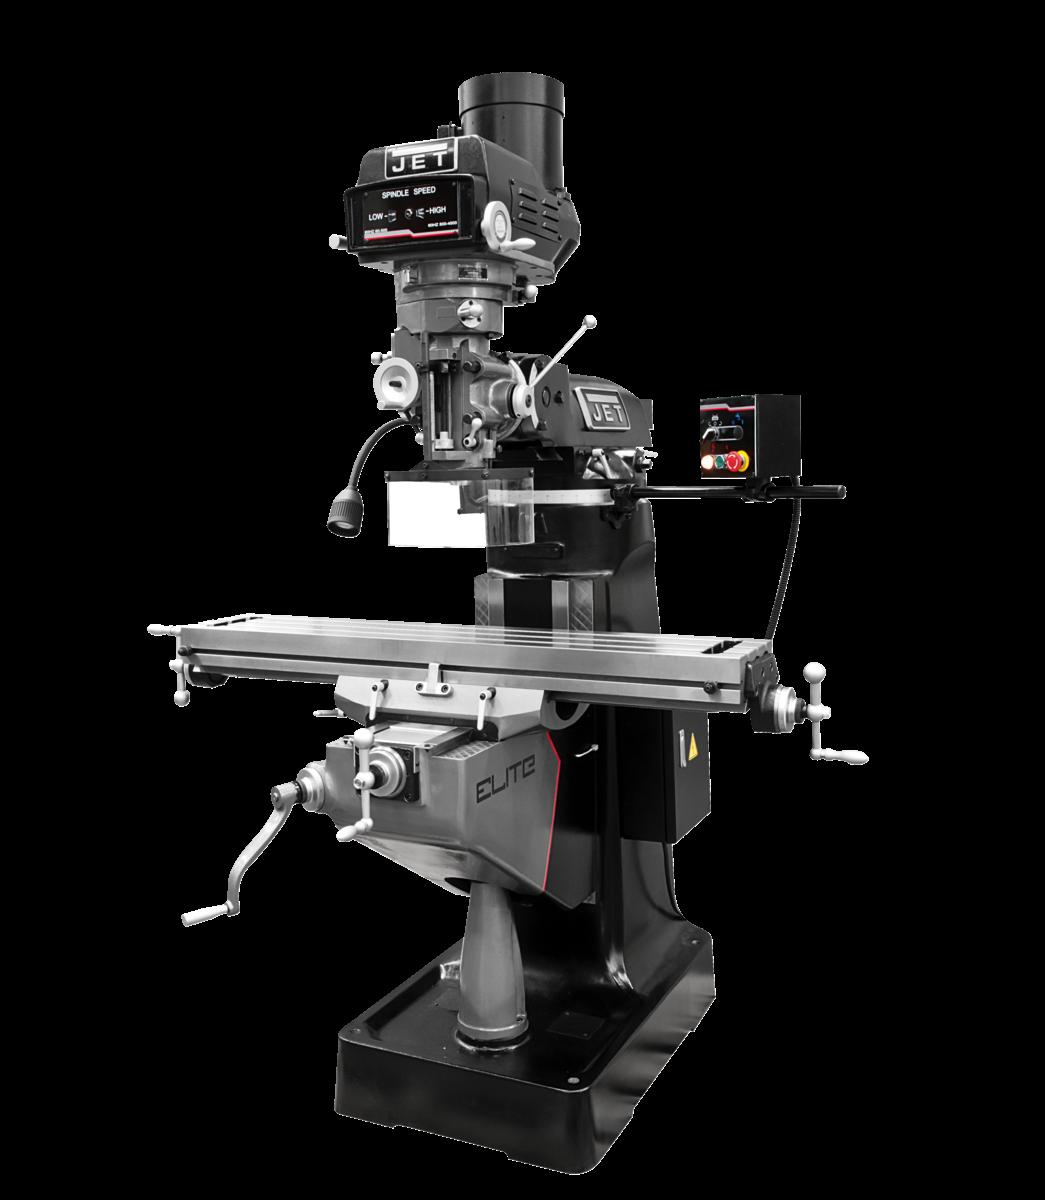 ETM-949 Mill with Z-Axis JET Powerfeed